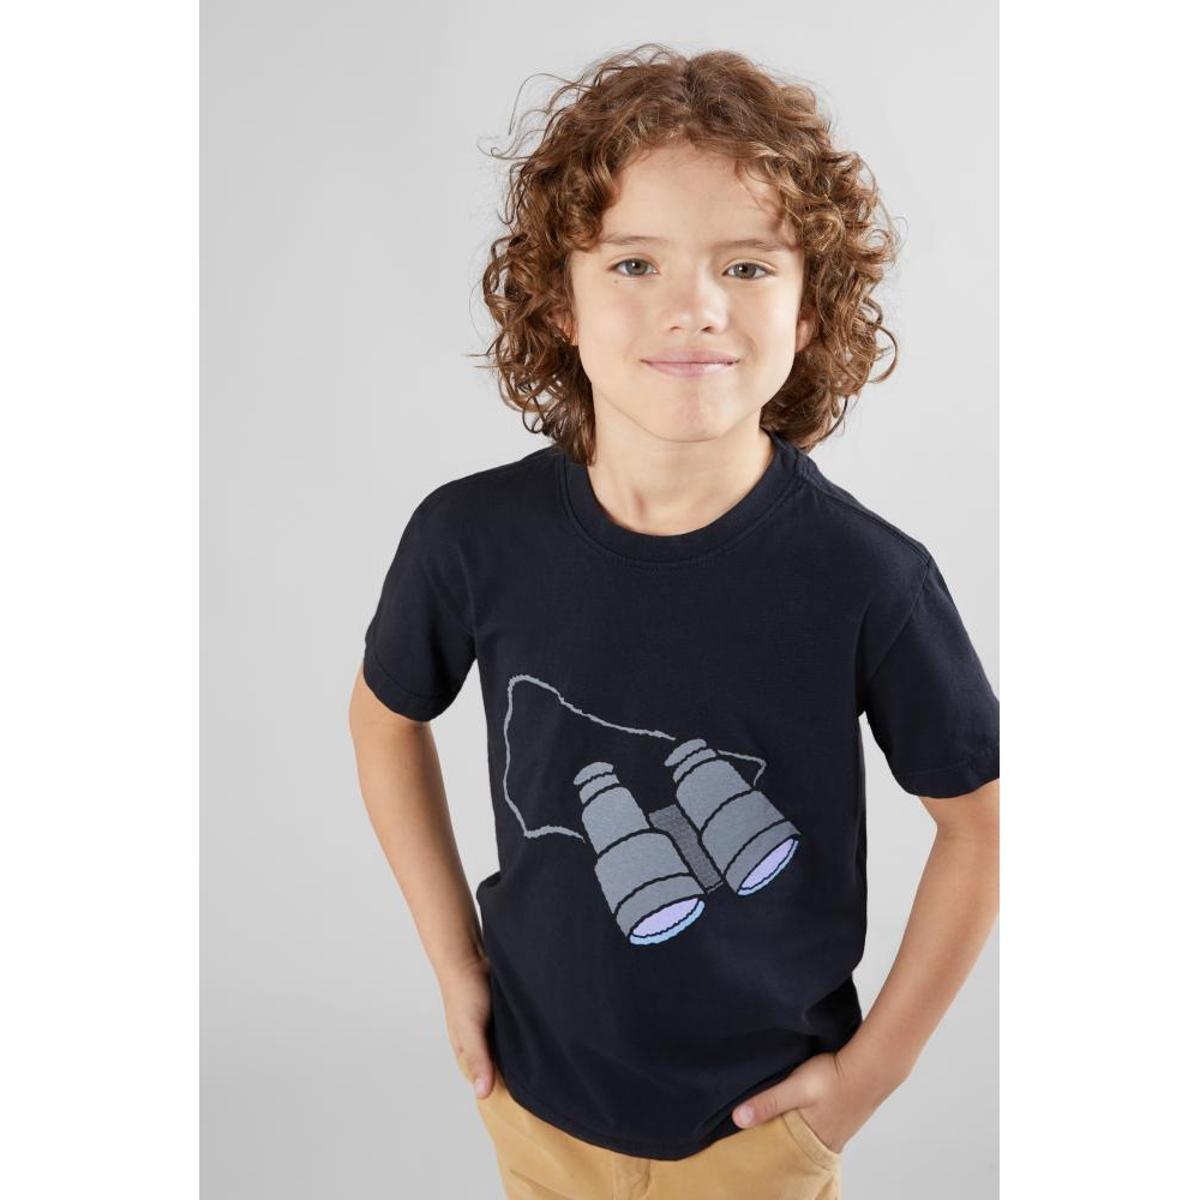 9c047d6dab Camiseta Infantil Wally Binoculos Reserva Mini Masculina - Compre Agora